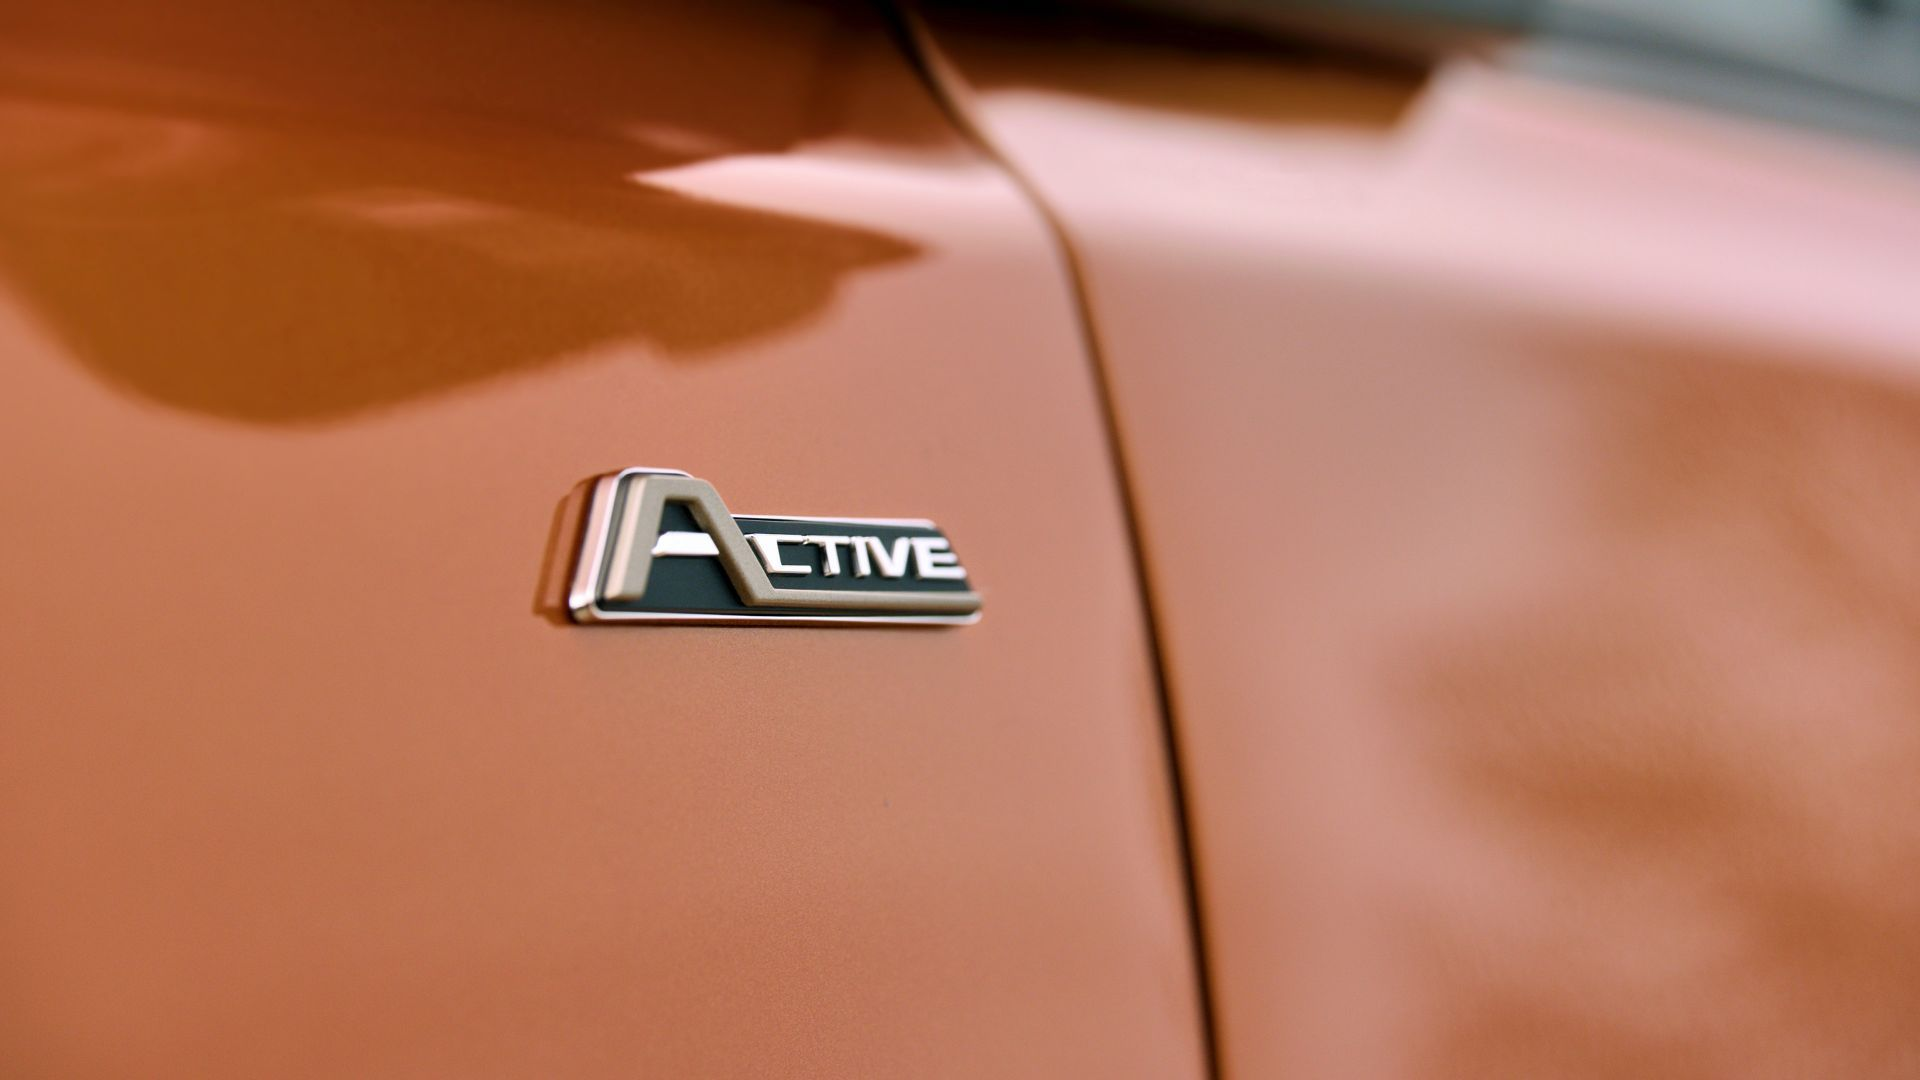 2021-Ford-Tourneo-Custom-Active-Euro-spec-8